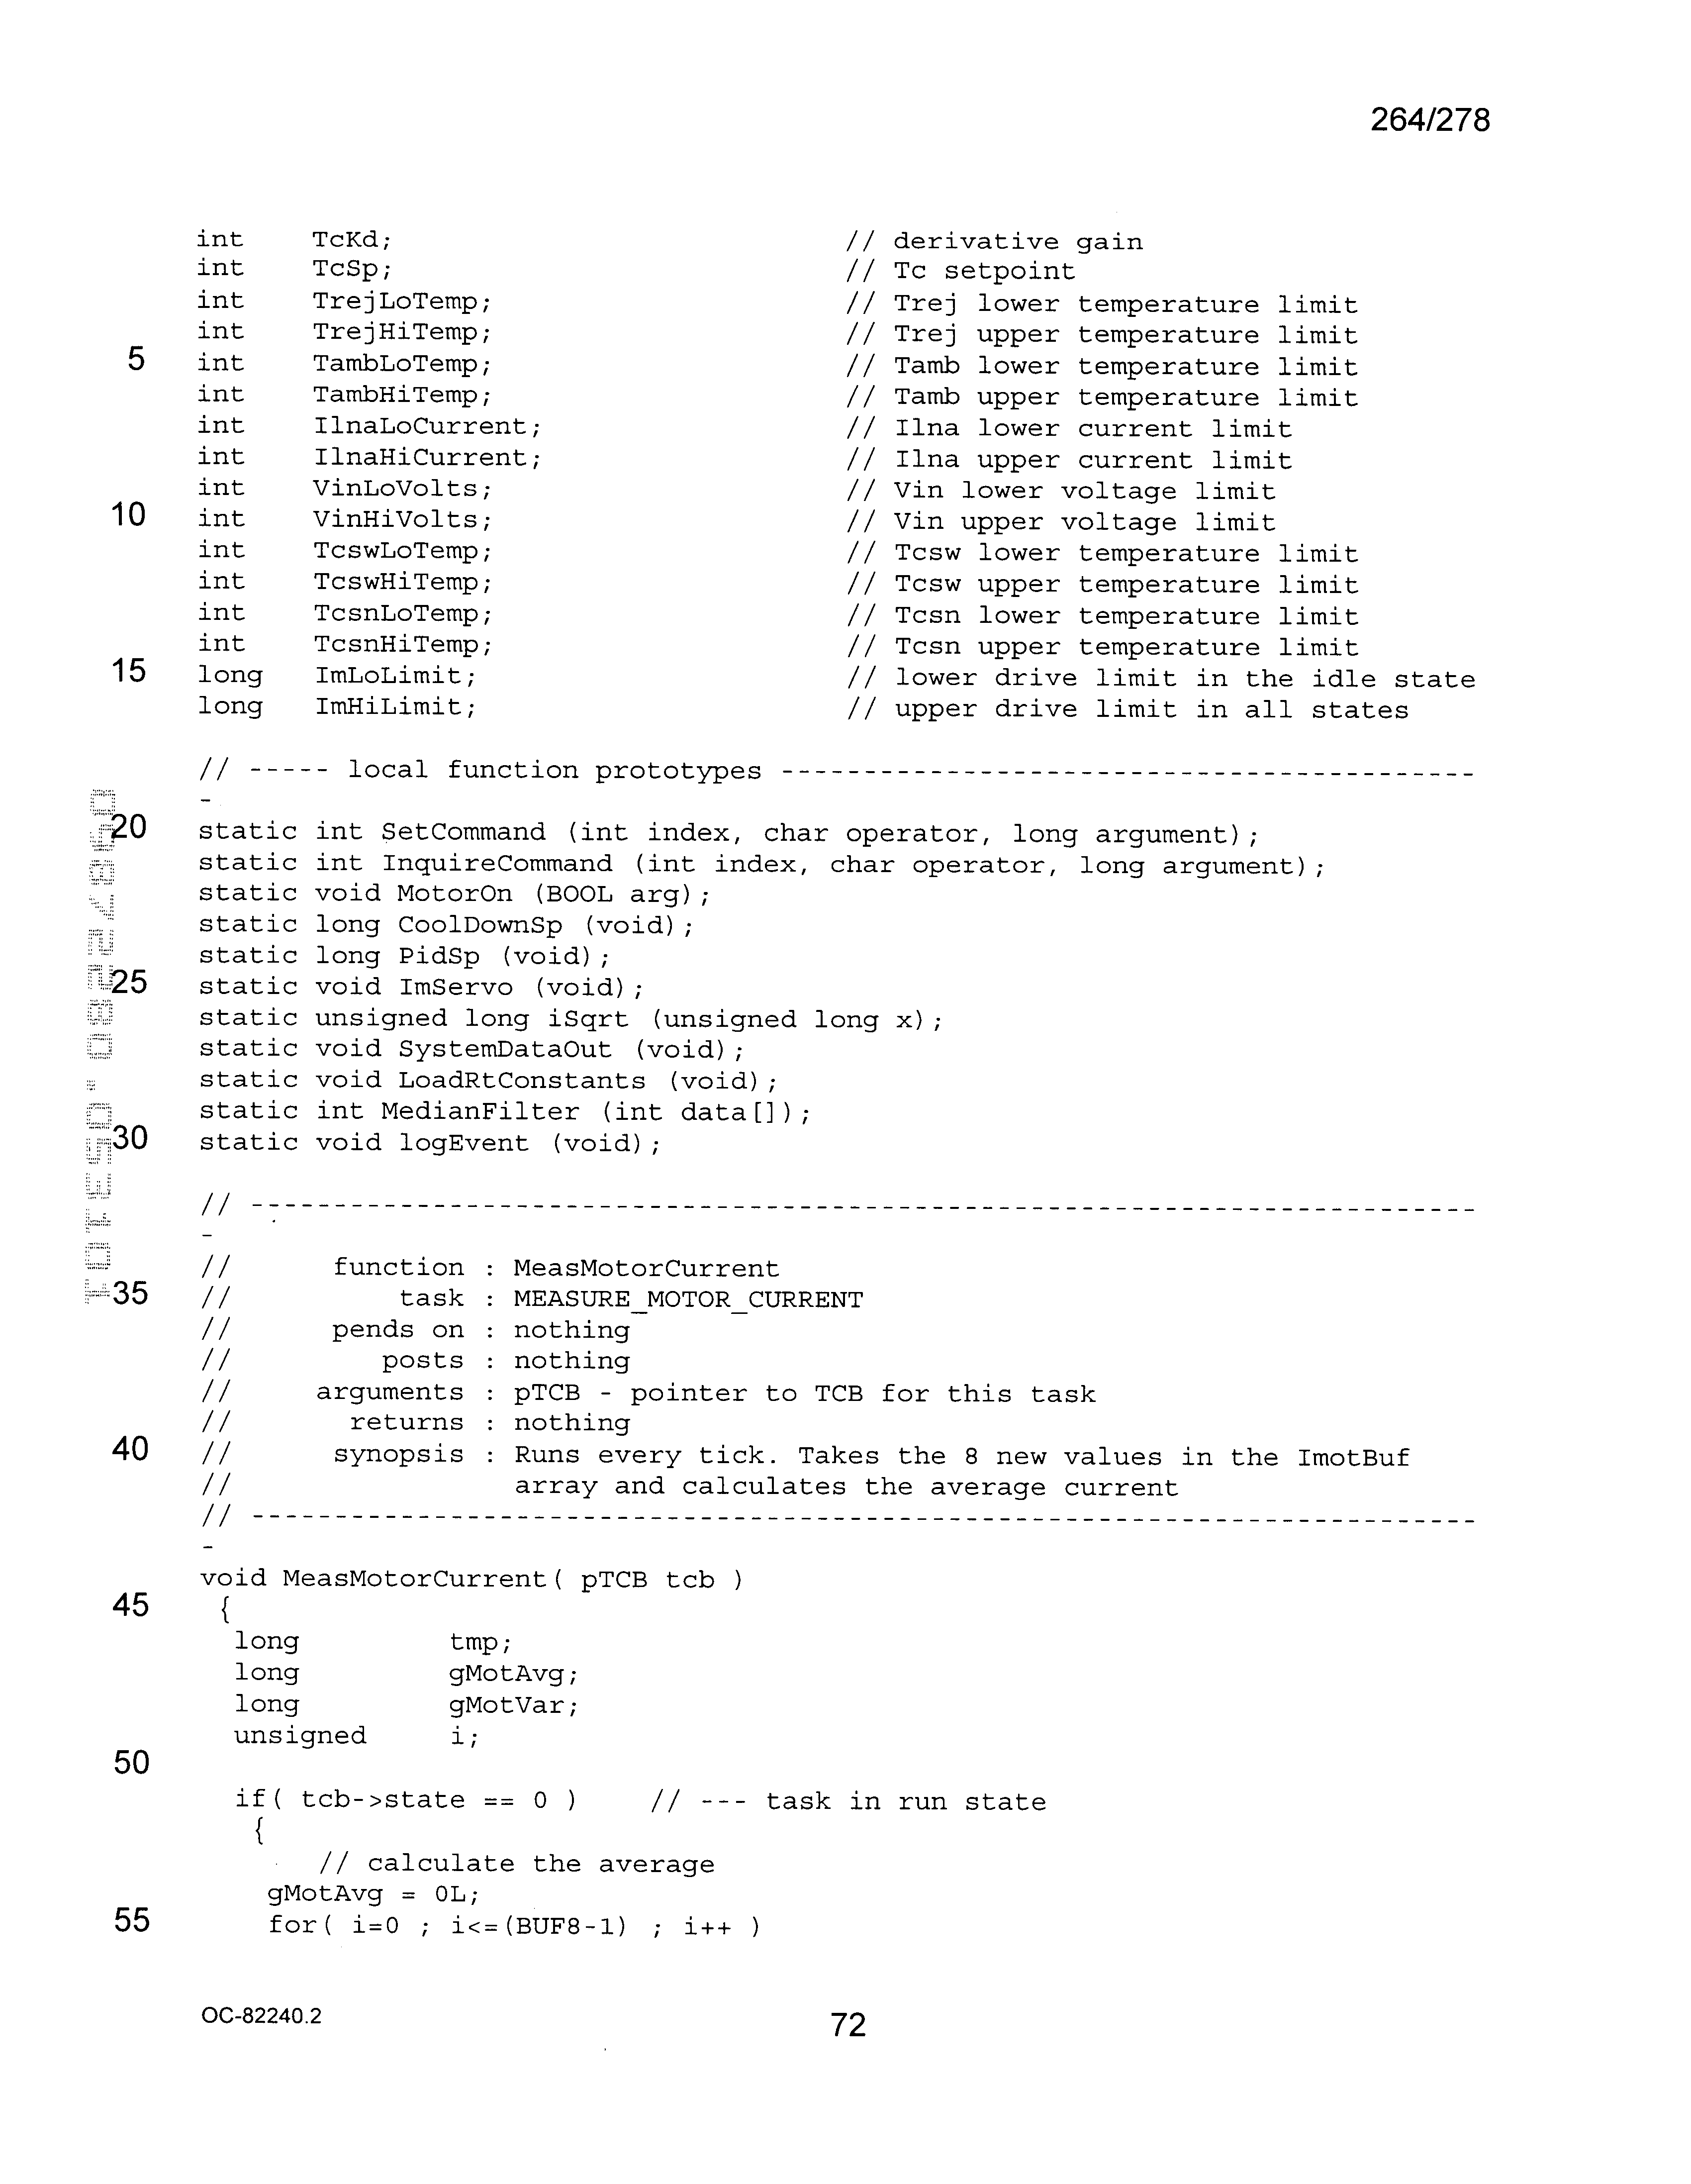 US6446444B1 - Digital signal process control of stirling